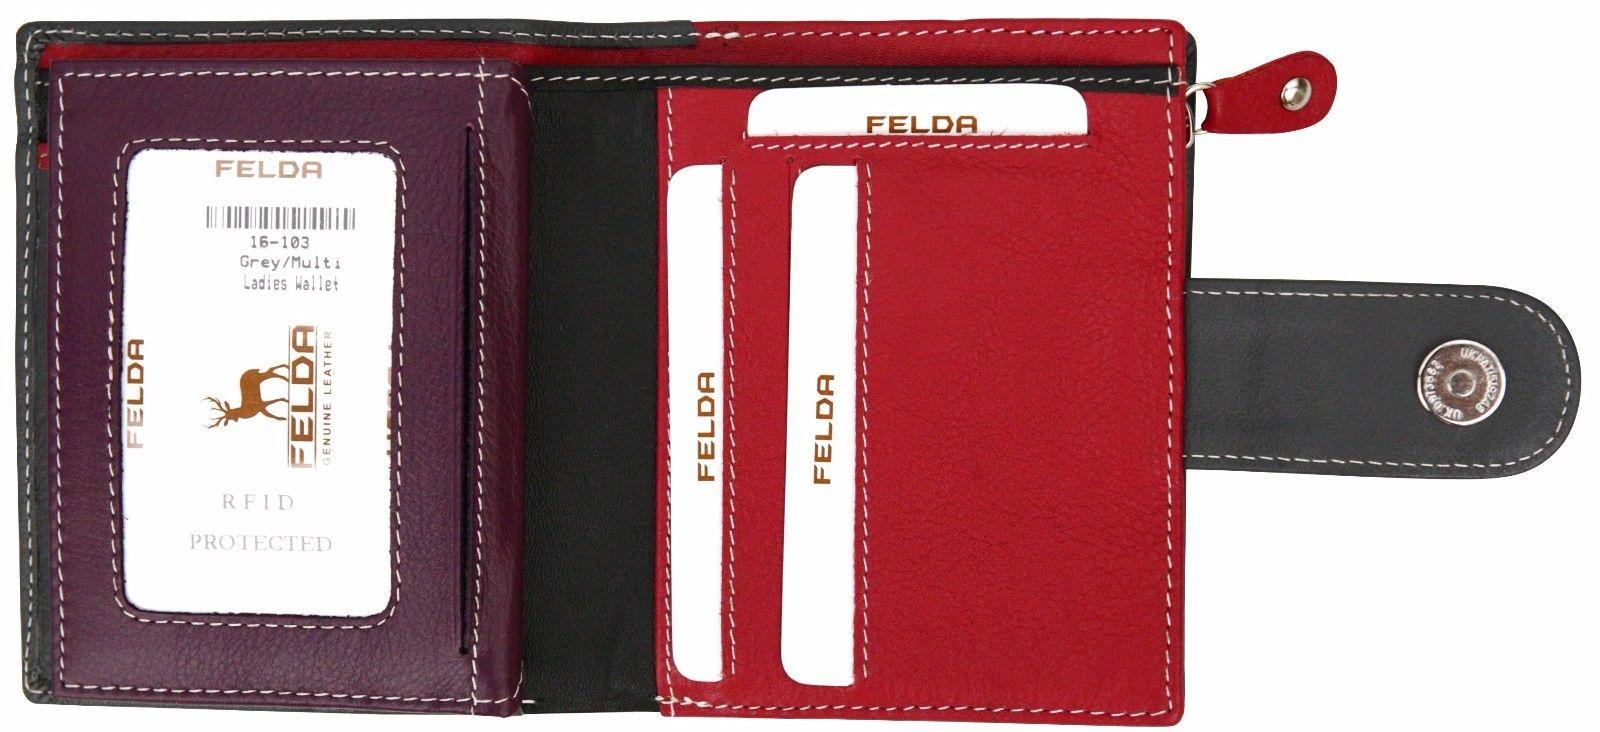 Felda-RFID-onorevoli-MEDAGLIA-amp-Card-Purse-Wallet-Genuine-Leather-Multi-SOFT-BOX-REGALO miniatura 40